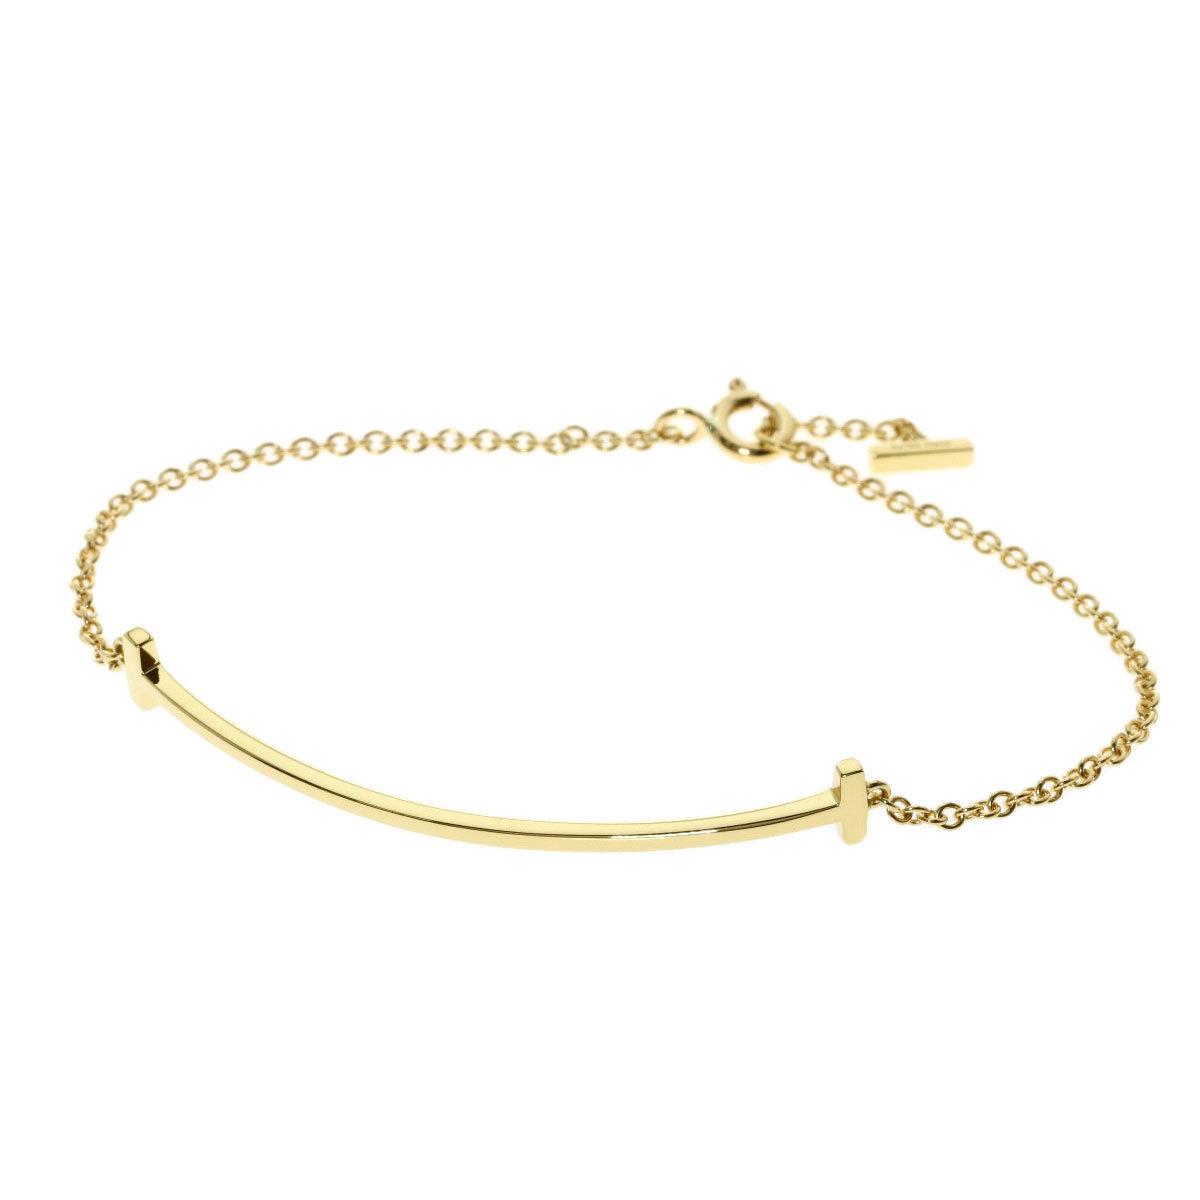 Tiffany T Smile Small Bracelet K18 Yellow Gold Ladies